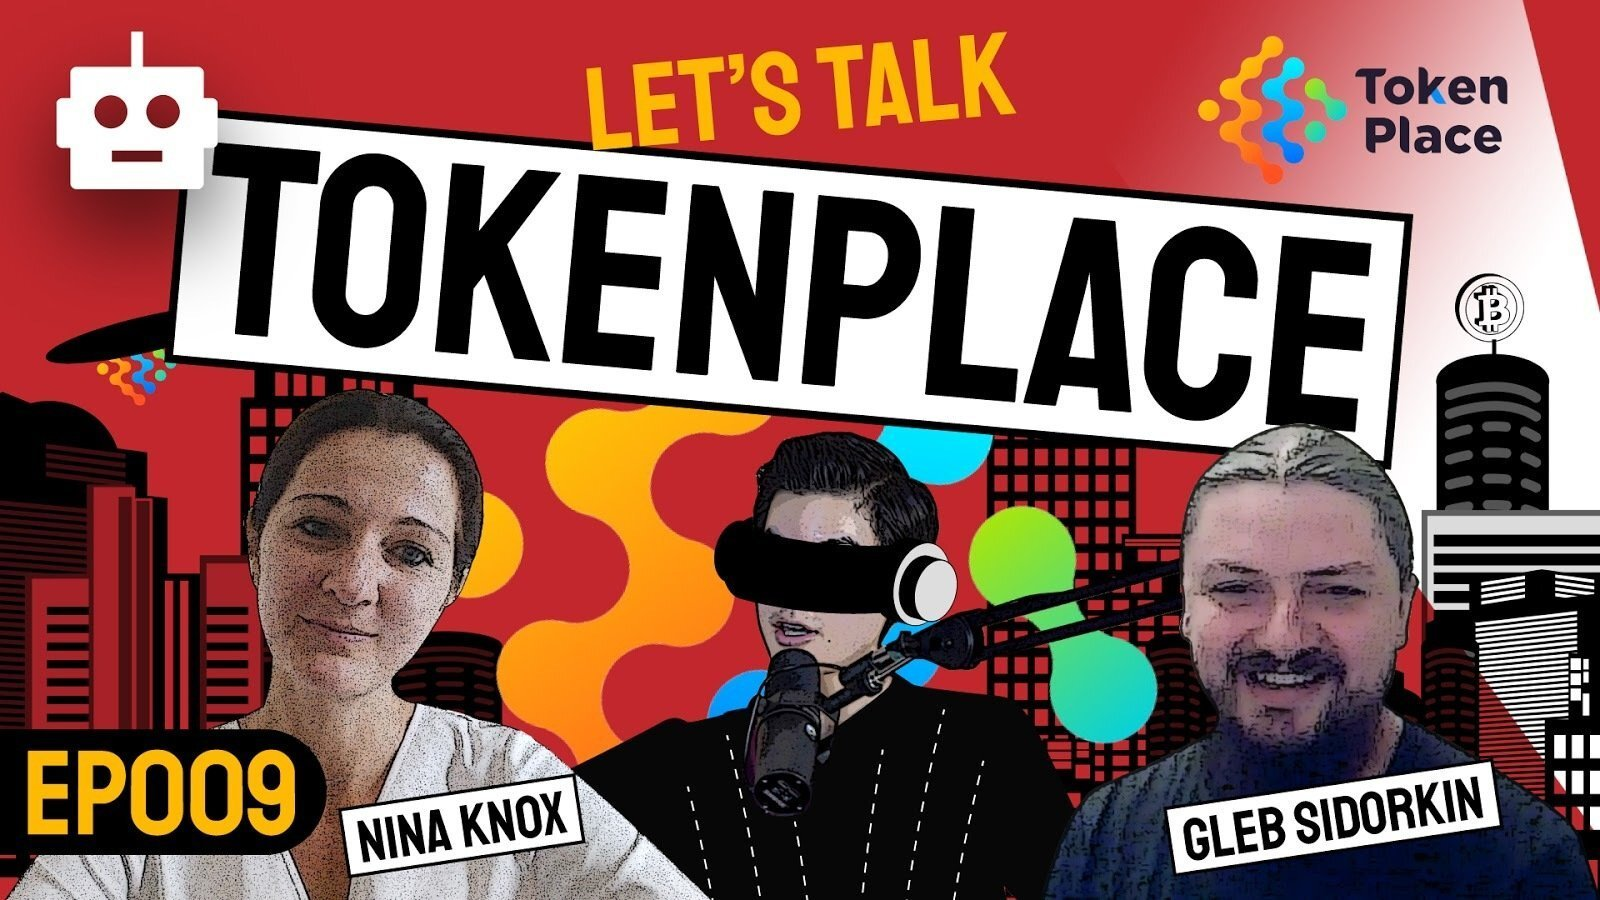 Tokenplace:数字资产的真正潜力在于大众化